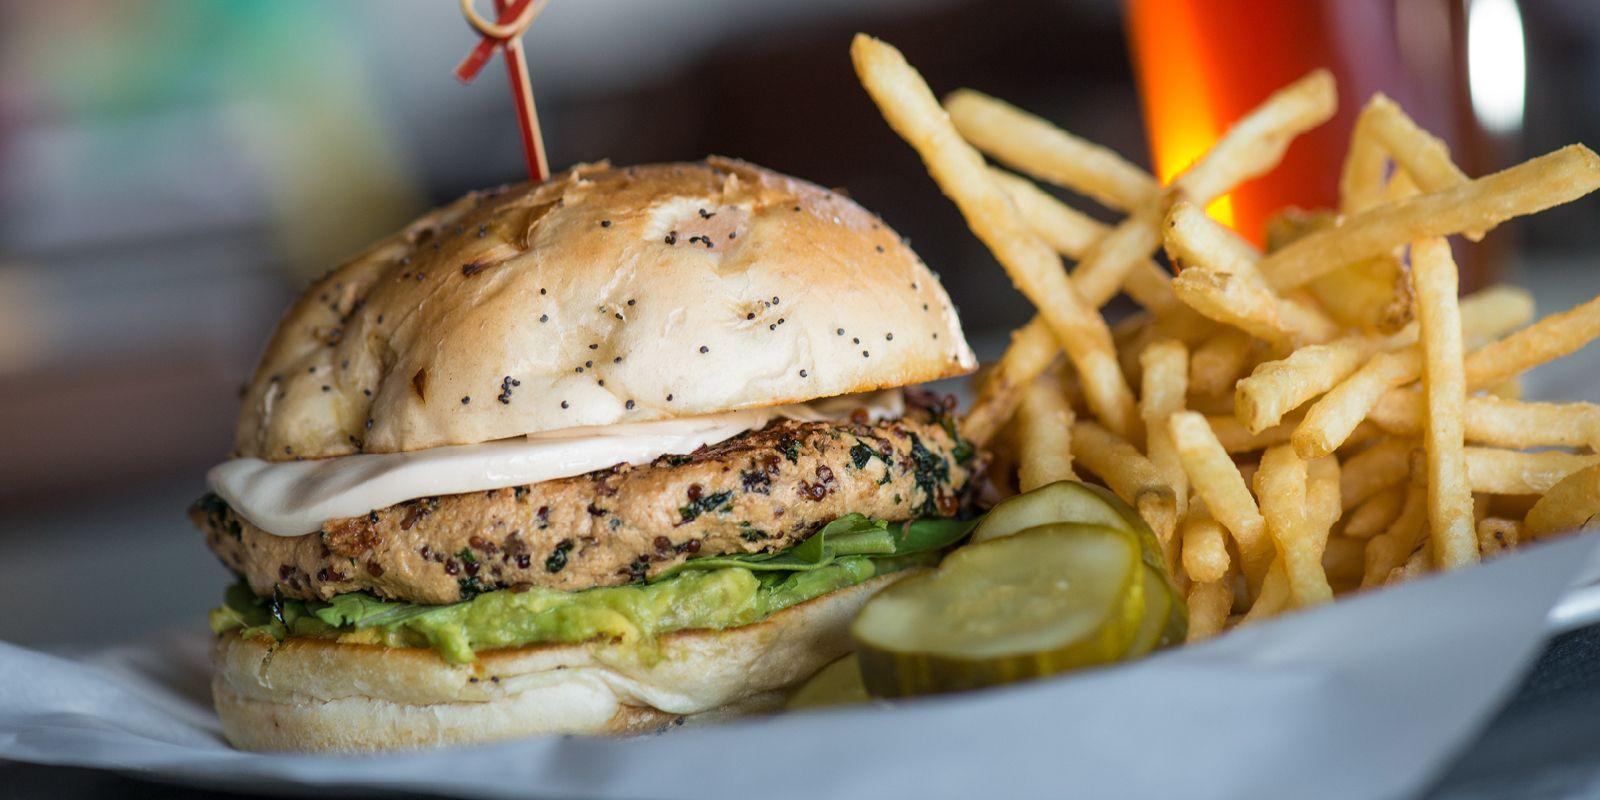 Yard House - Vegan Burger - red, quinoa, kale, shiitakes, daiya mozzarella, avocado, tomato, arugula, onion, miso, onion bun